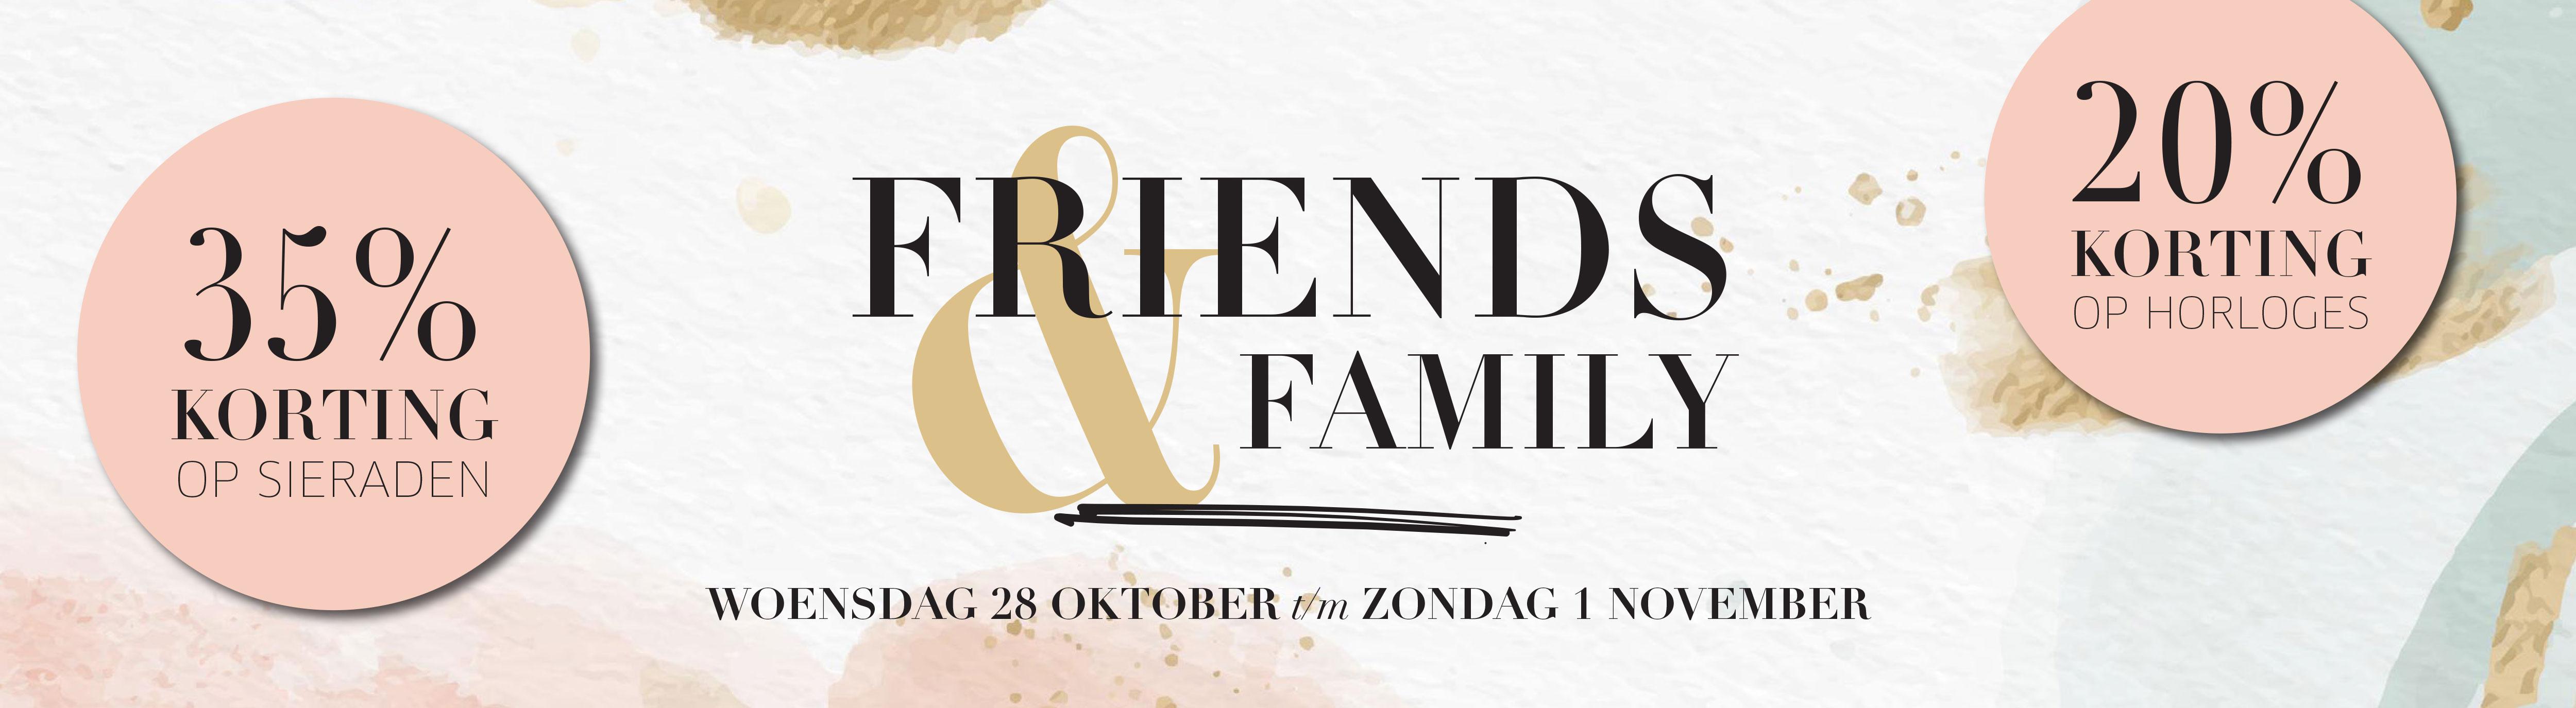 Friends & Family oktober